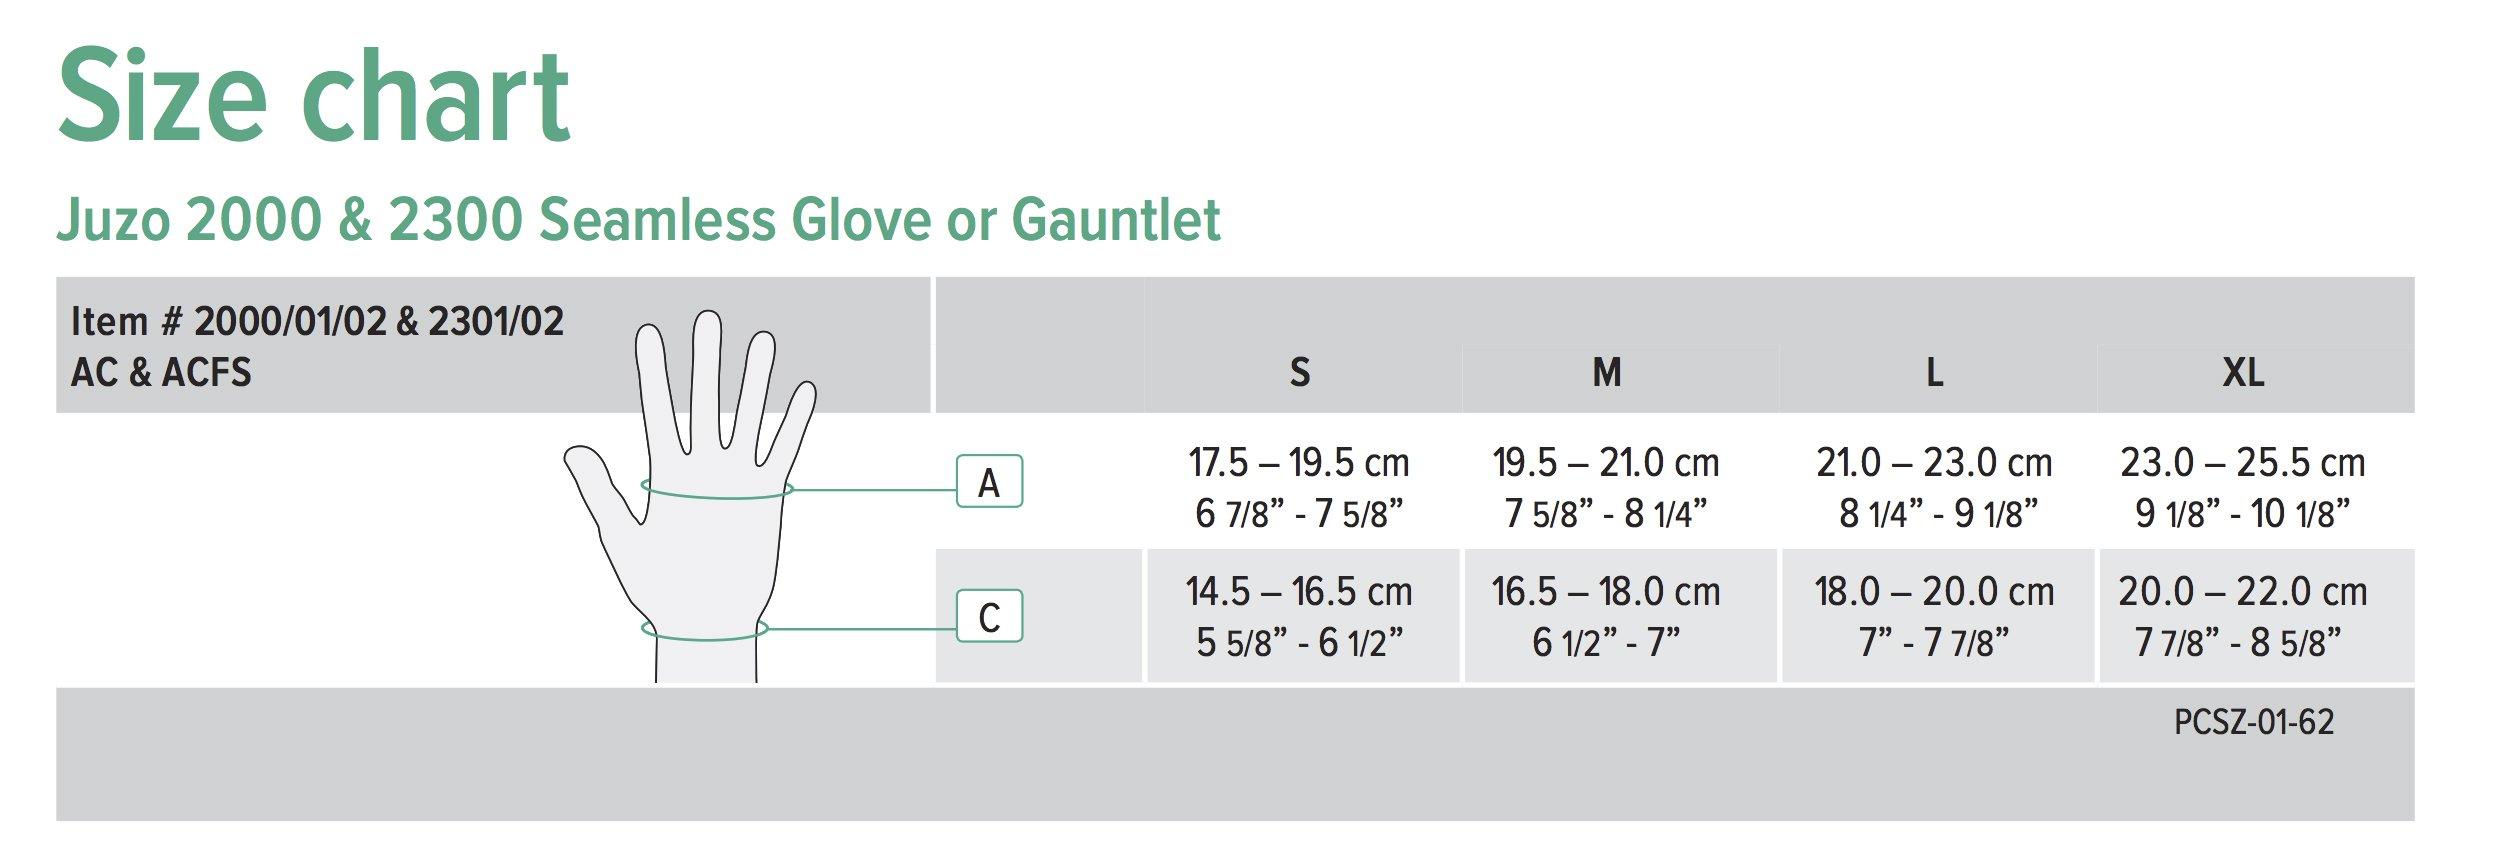 juzo soft seamless glove gauntlet size chart